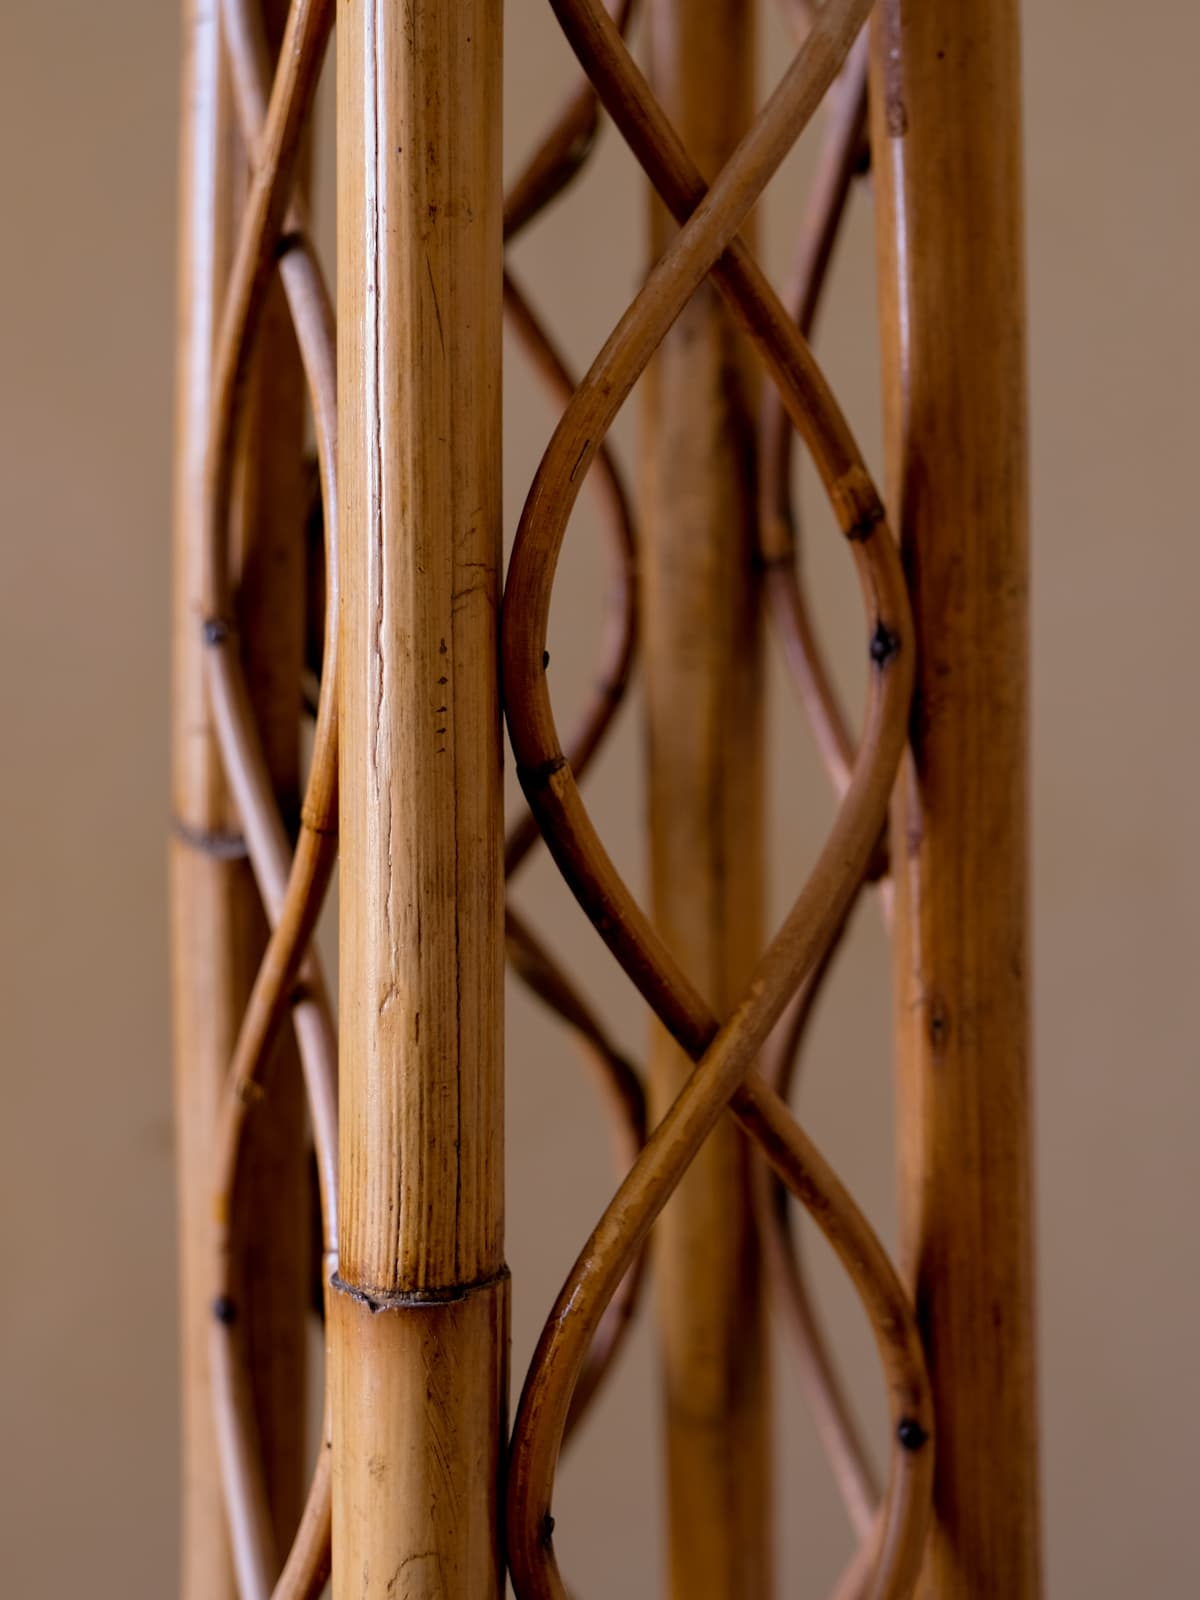 Bulrush & wicker floor lamp, 60's